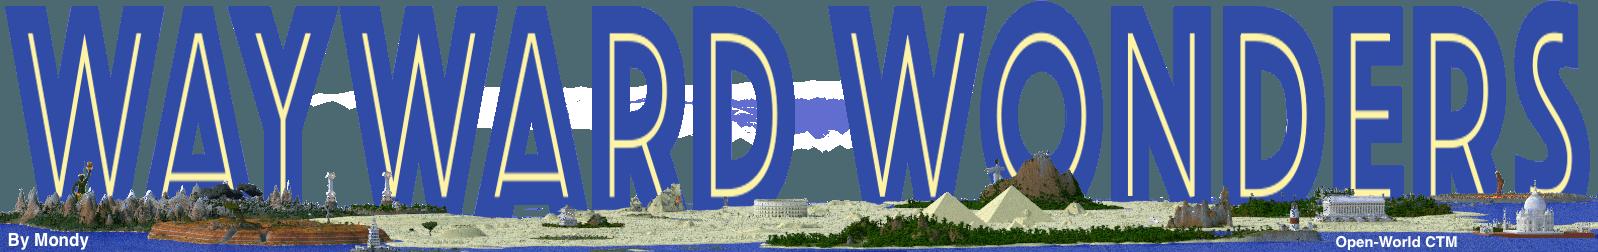 Wayward Wonders